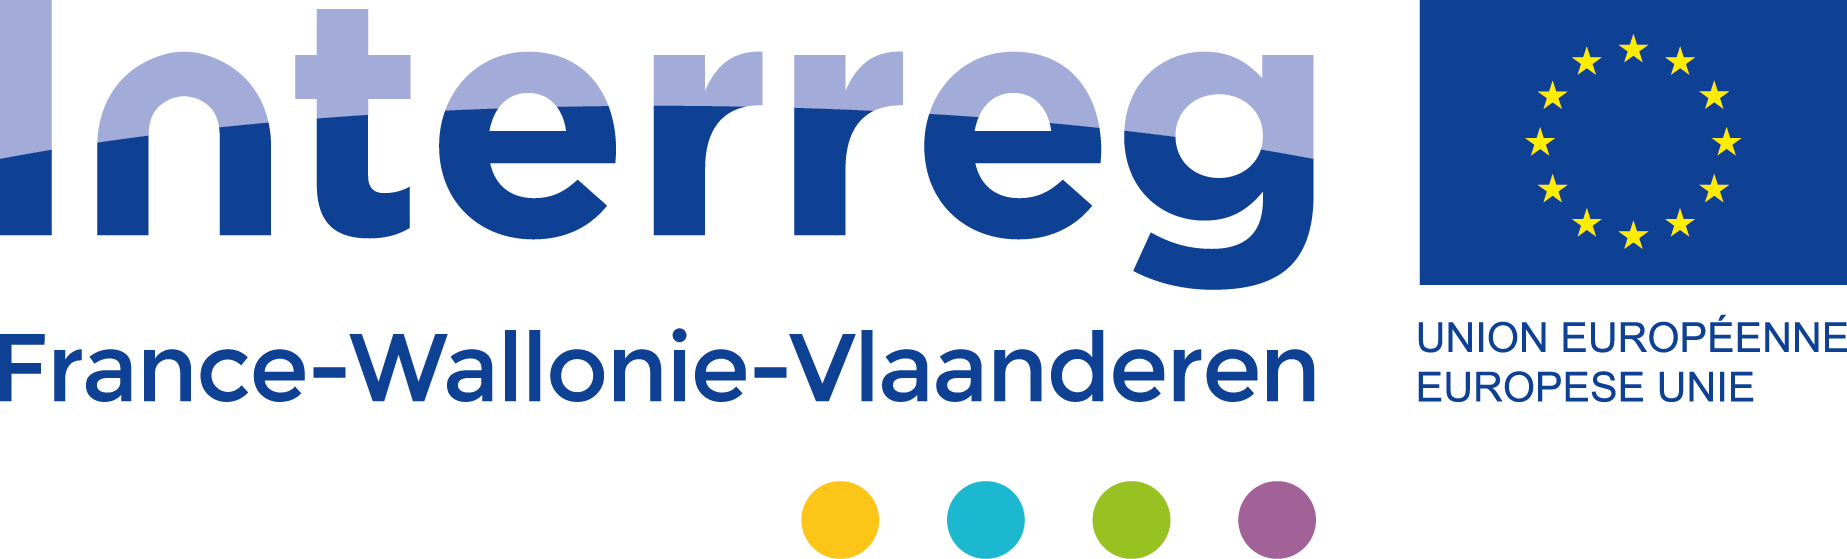 Logo Interreg France-Wallonie-Vlaanderen